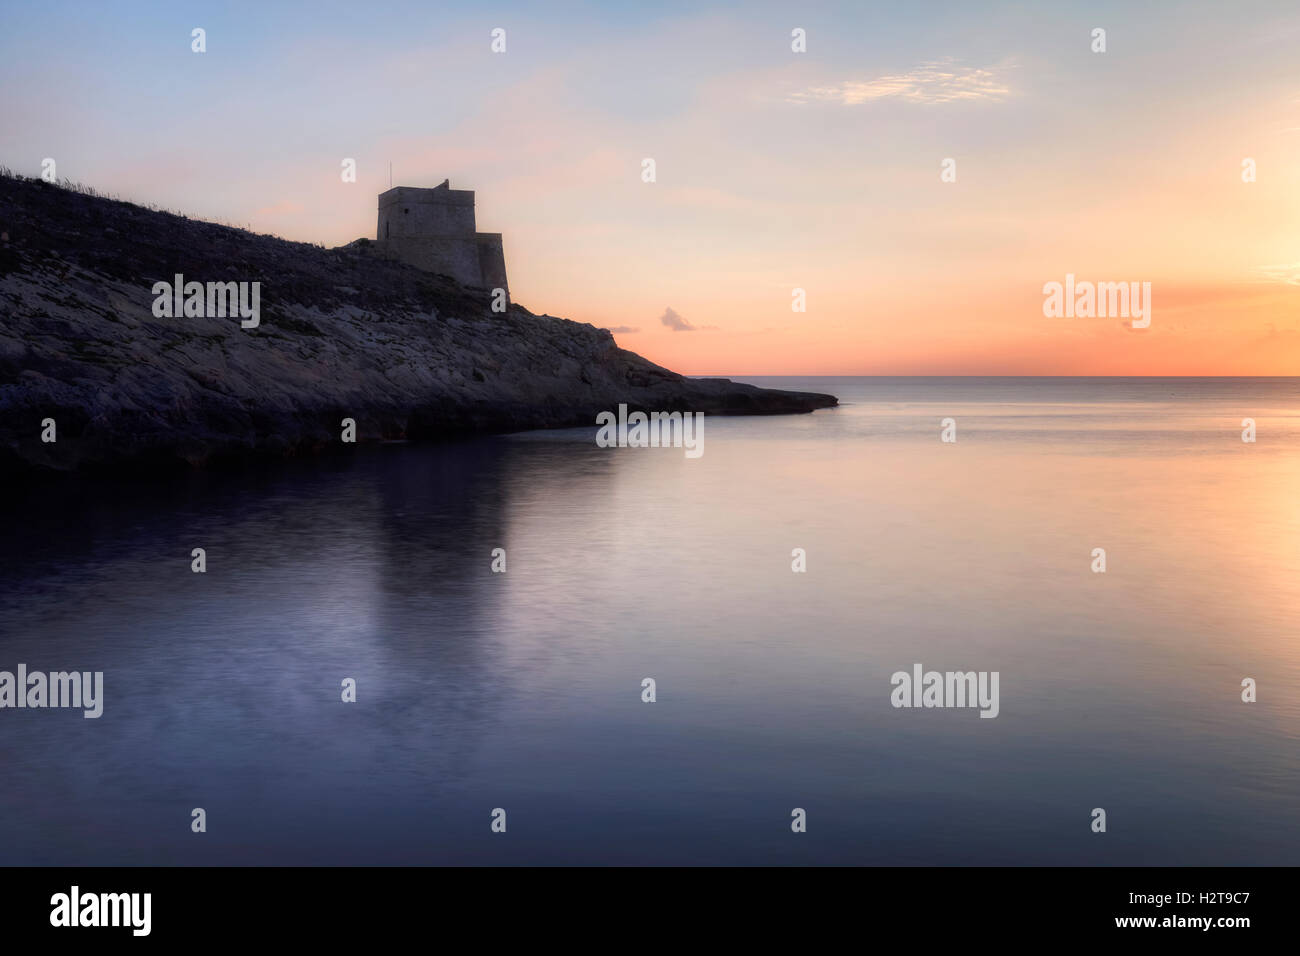 Bahía de Xlendi, Torre, Xlendi, en Gozo, Malta Imagen De Stock